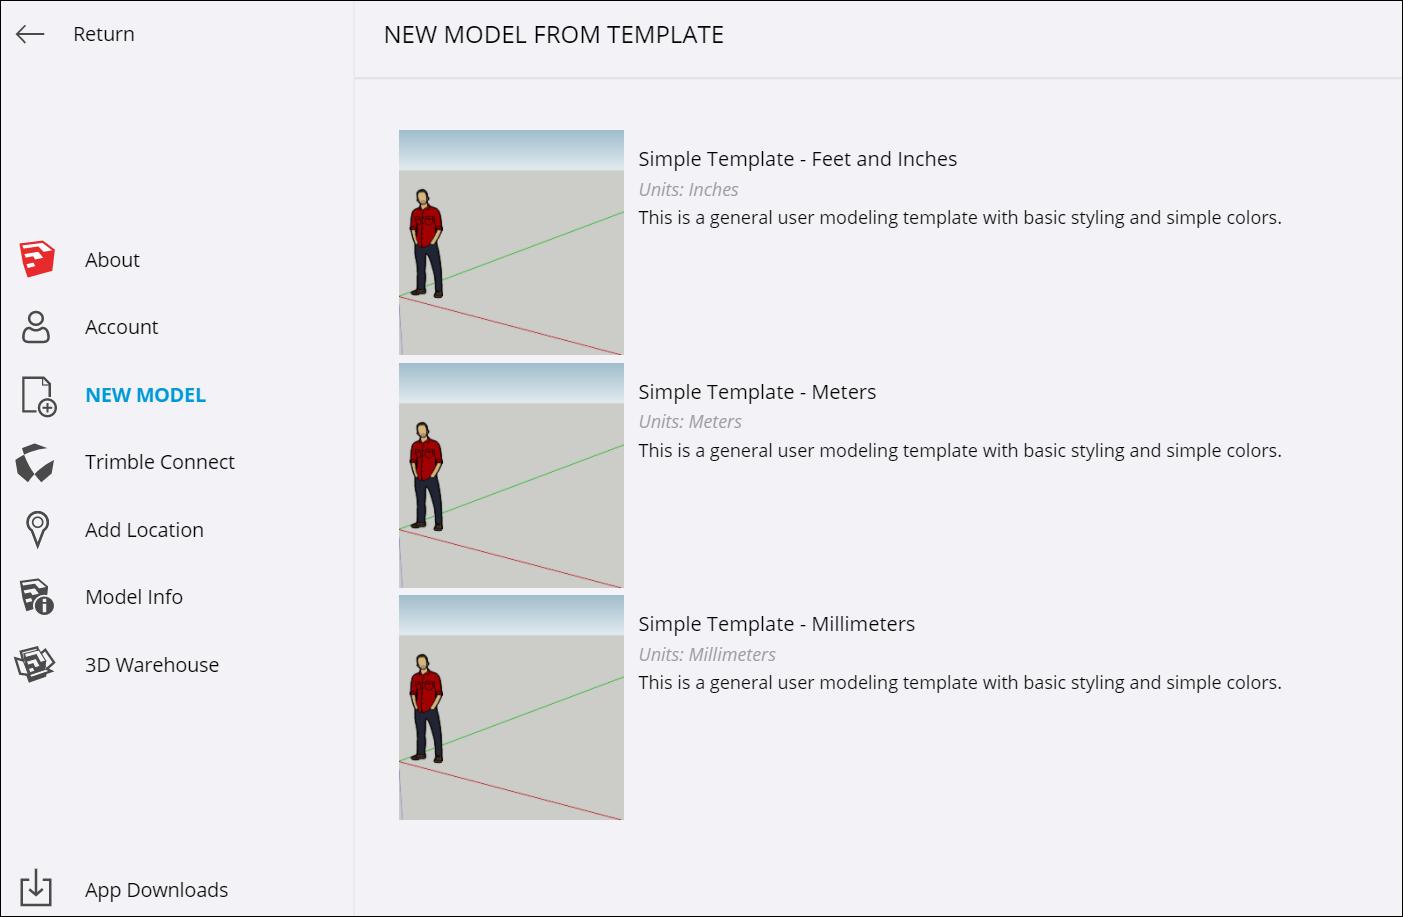 Creating and editing models sketchup knowledge base selecting a template in sketchup for web buycottarizona